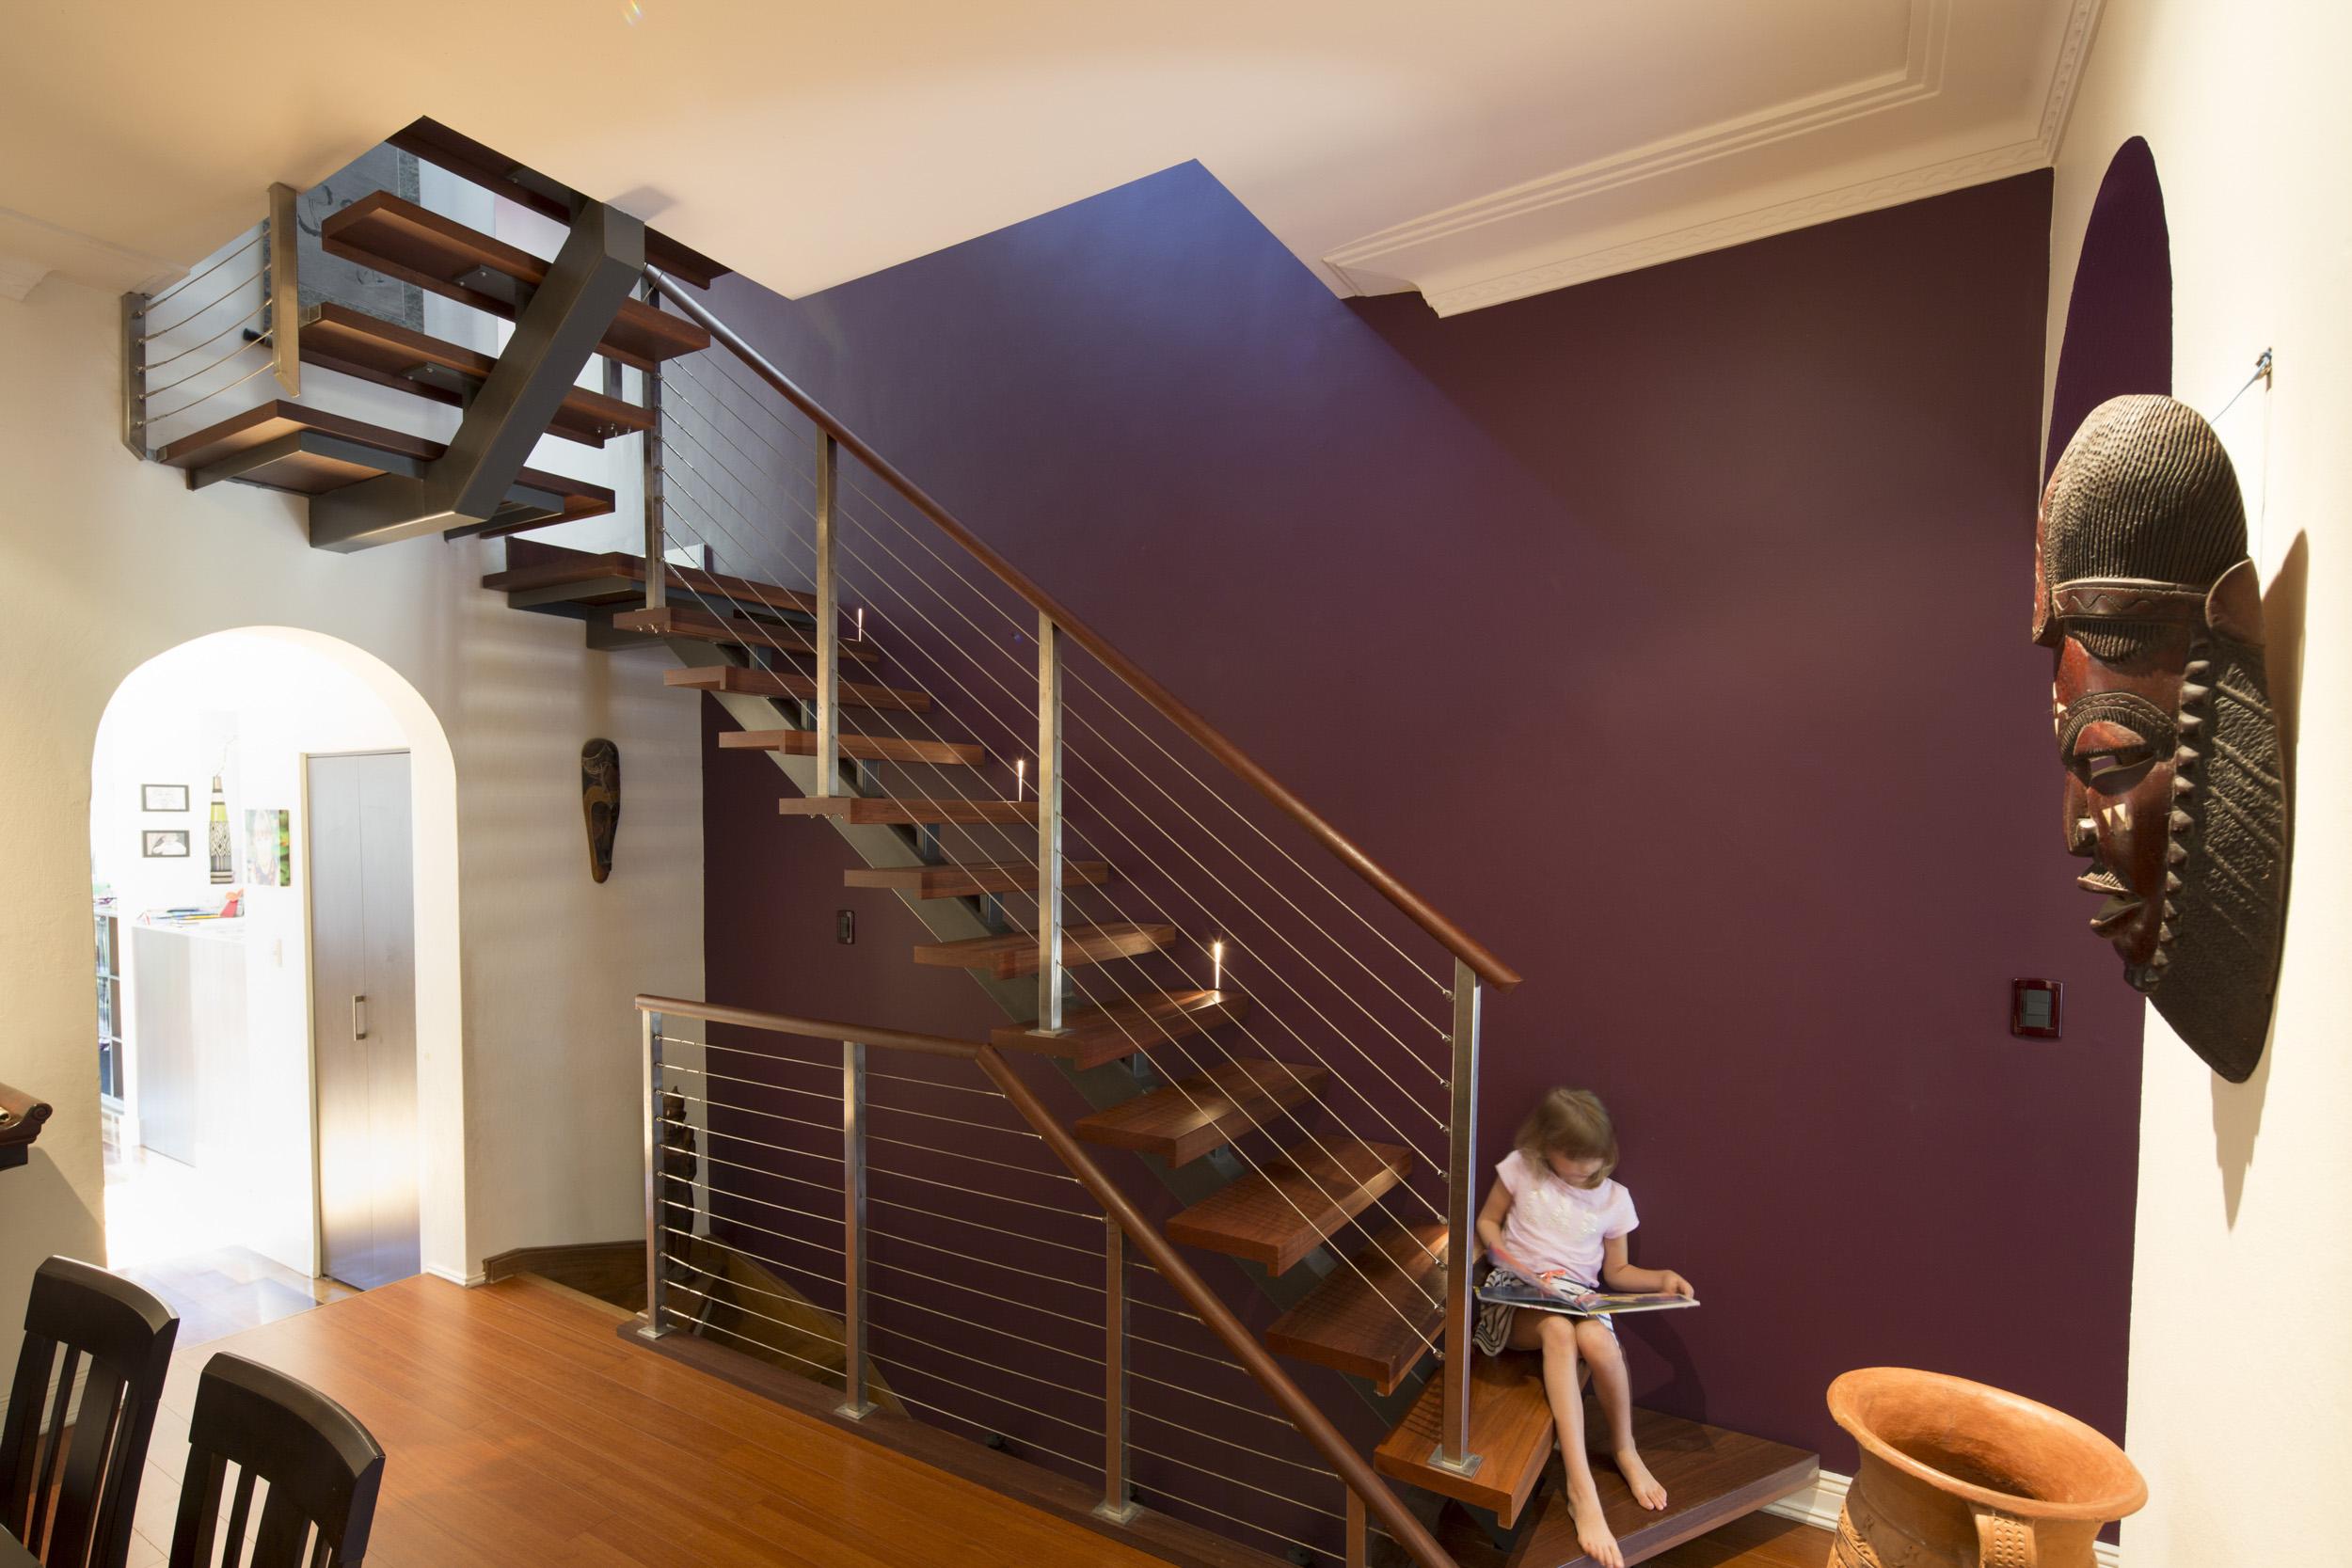 residential_architecture_sydney_australia_10.jpg